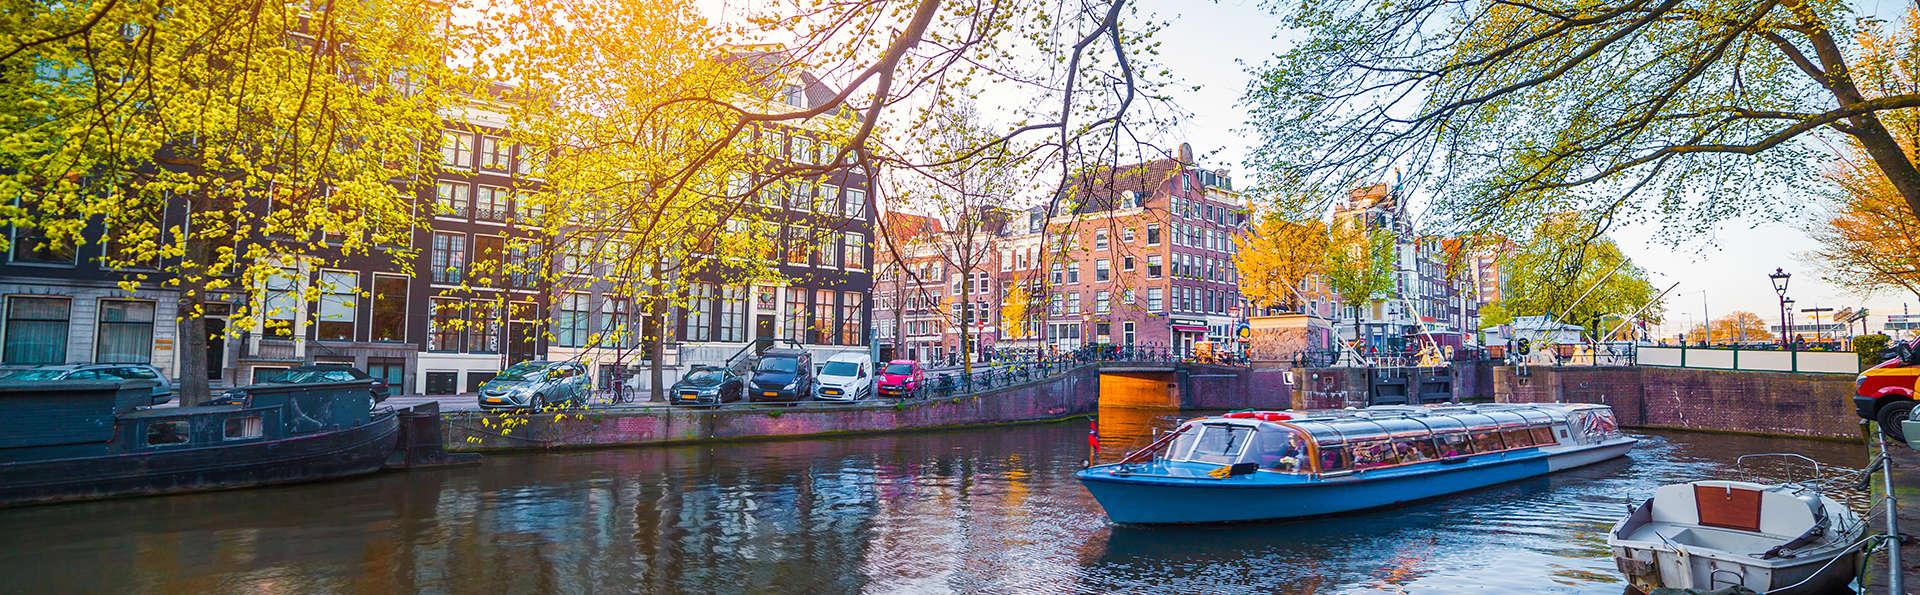 Bastion Hotel Amsterdam Noord - Edit_Amsterdam.jpg